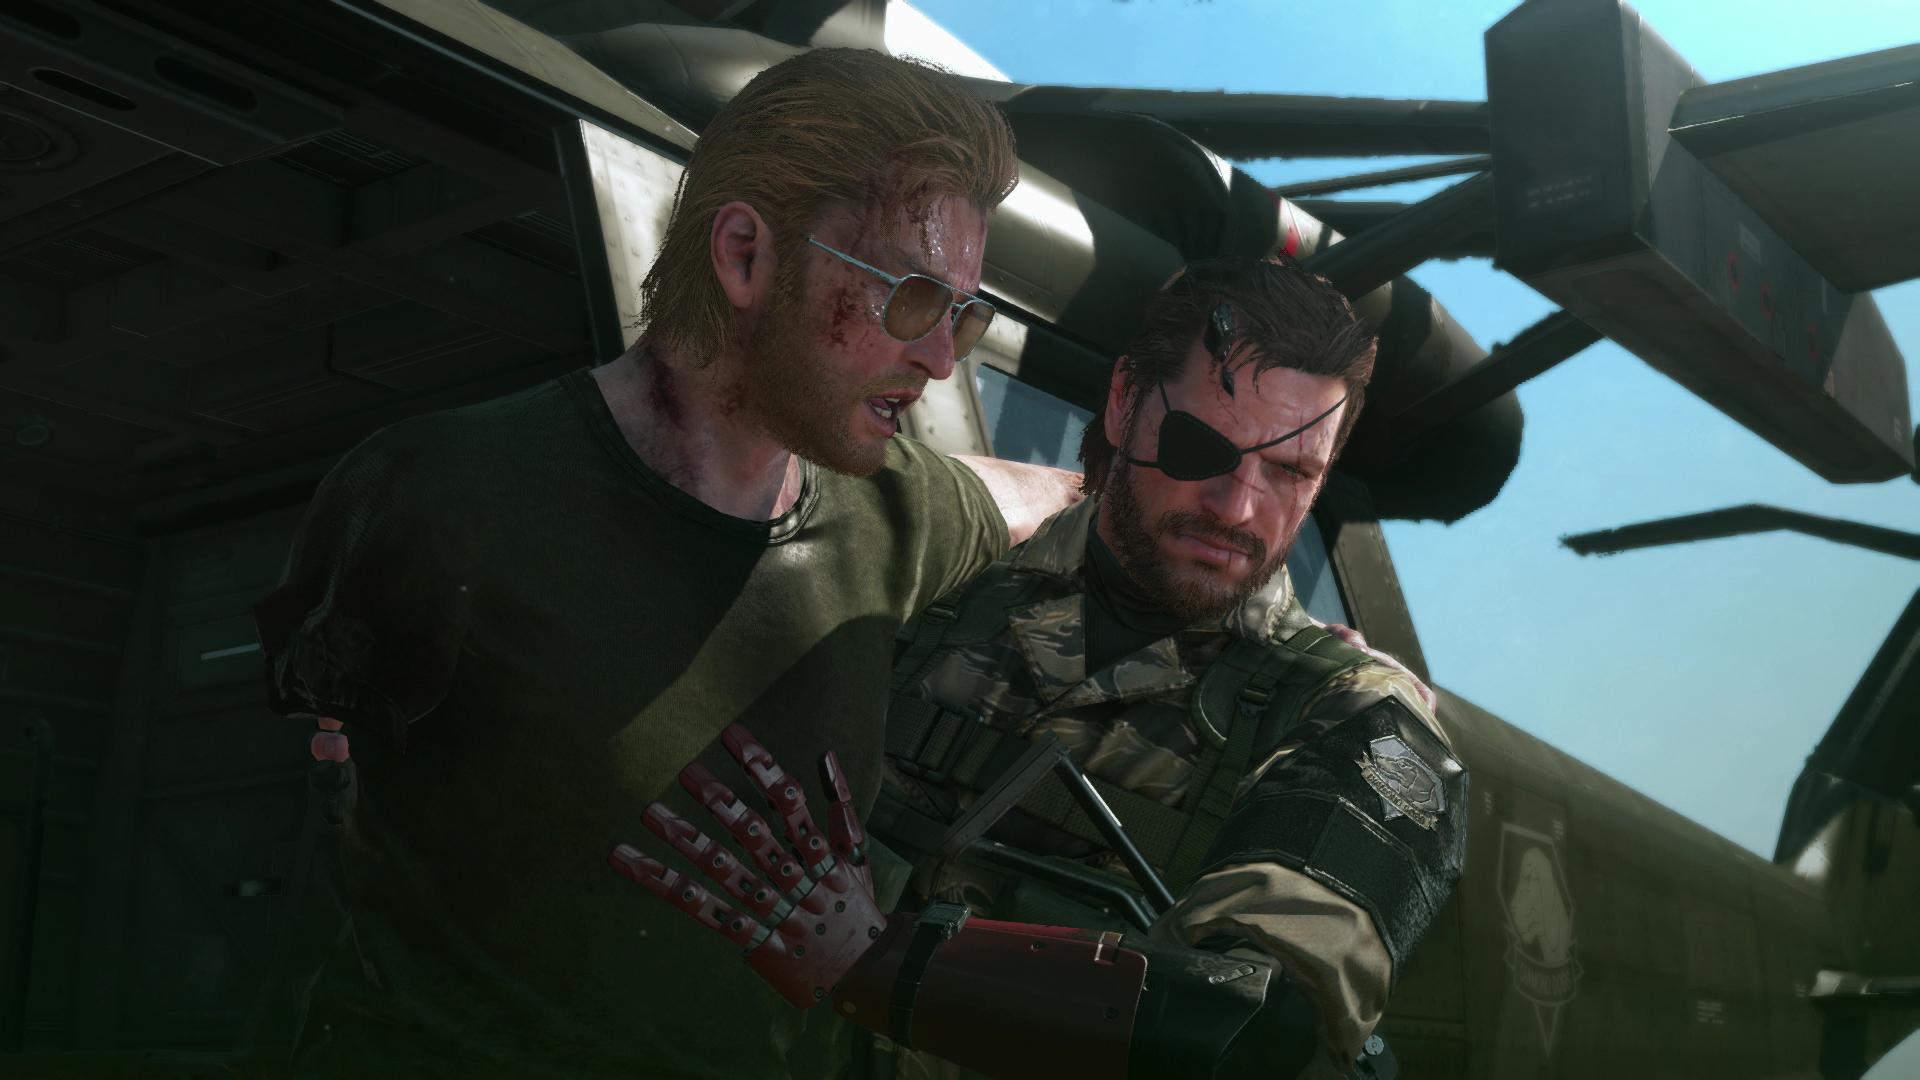 Metal Gear Solid V The Phantom Pain ESPAÑOL Descargar Full (CPY) + REPACK 5 DVD5 (JPW) 8